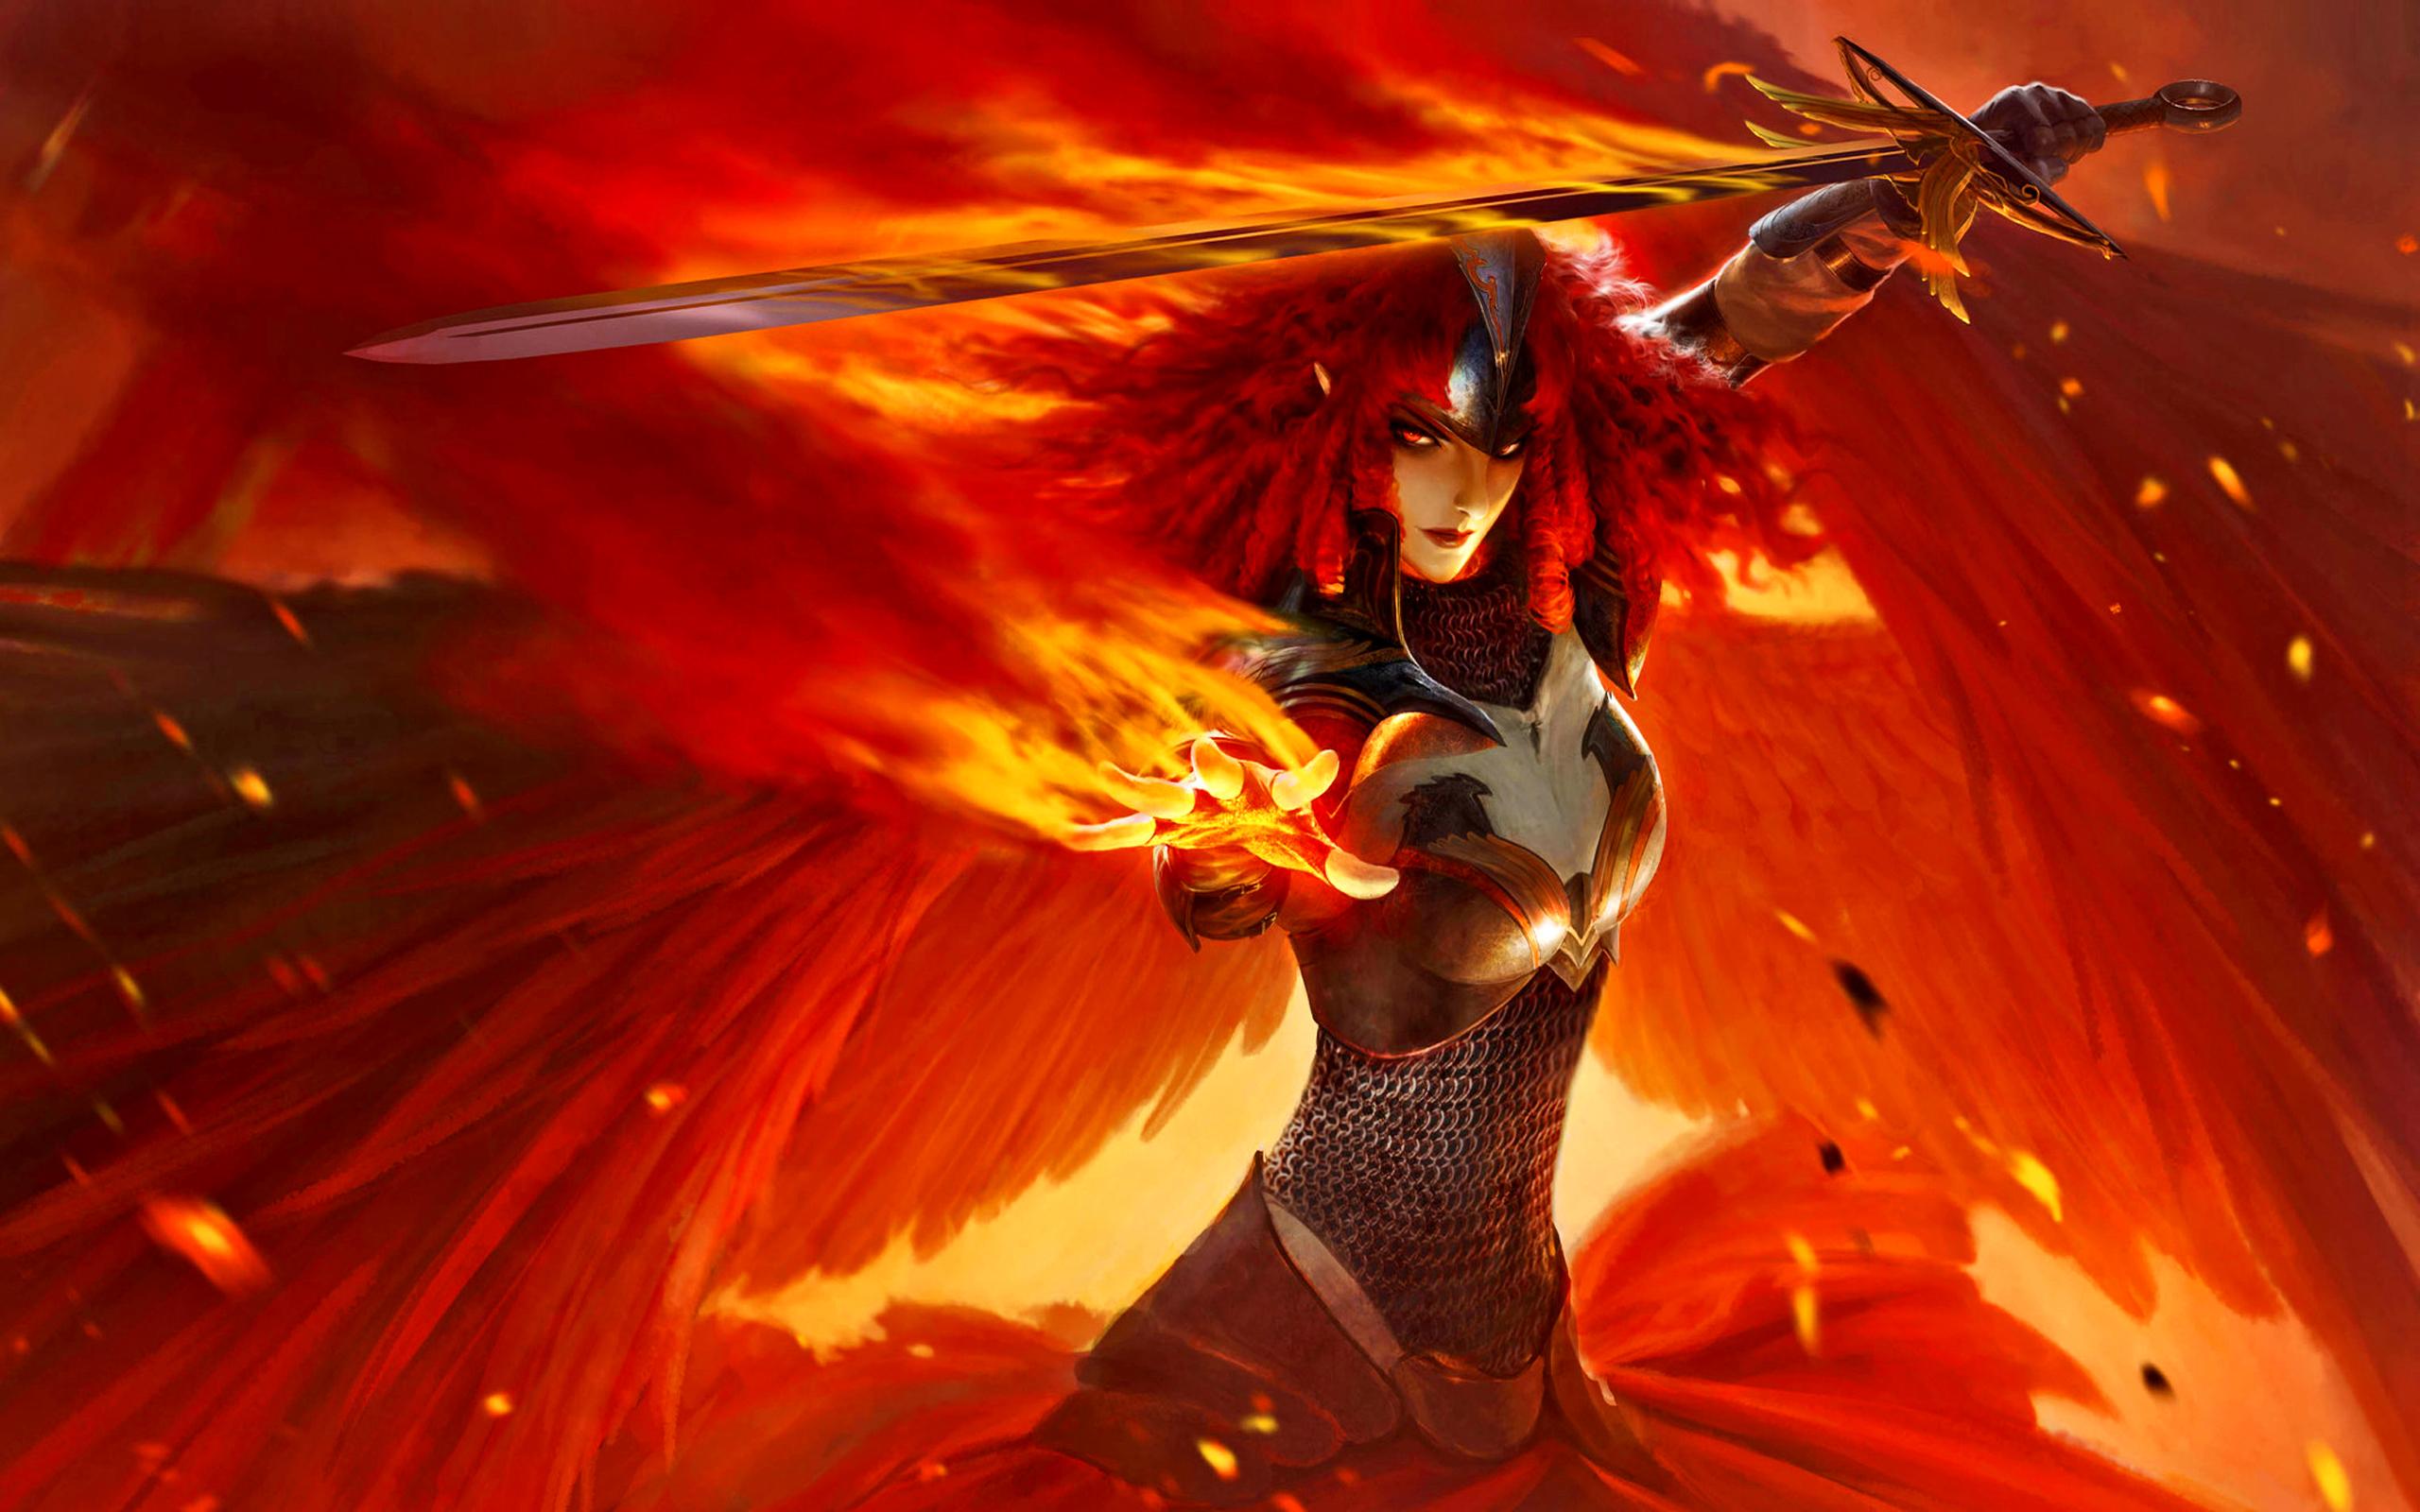 Mtg Iphone Wallpaper Angel Of Fire Wide Wallpaper 529114 Wallpapers13 Com